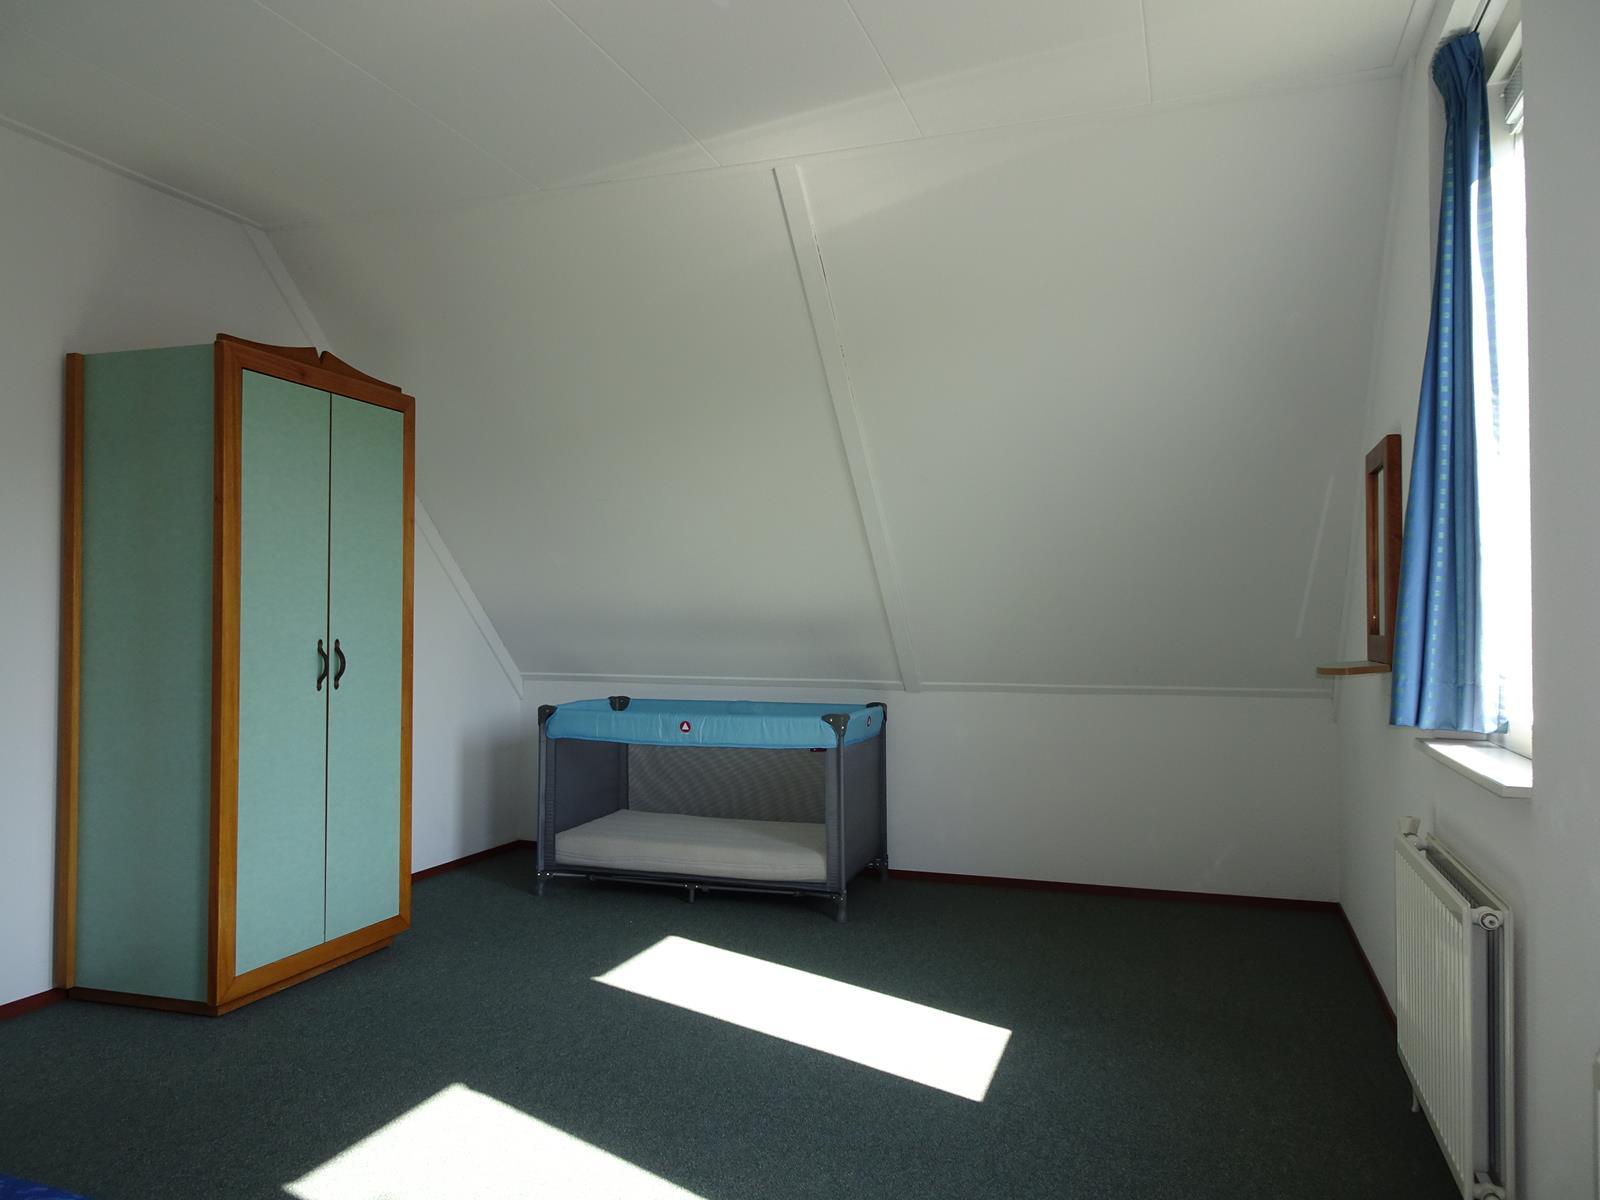 Vakantiehuis te koop Zeeland Bruinisse K41 (14).jpg